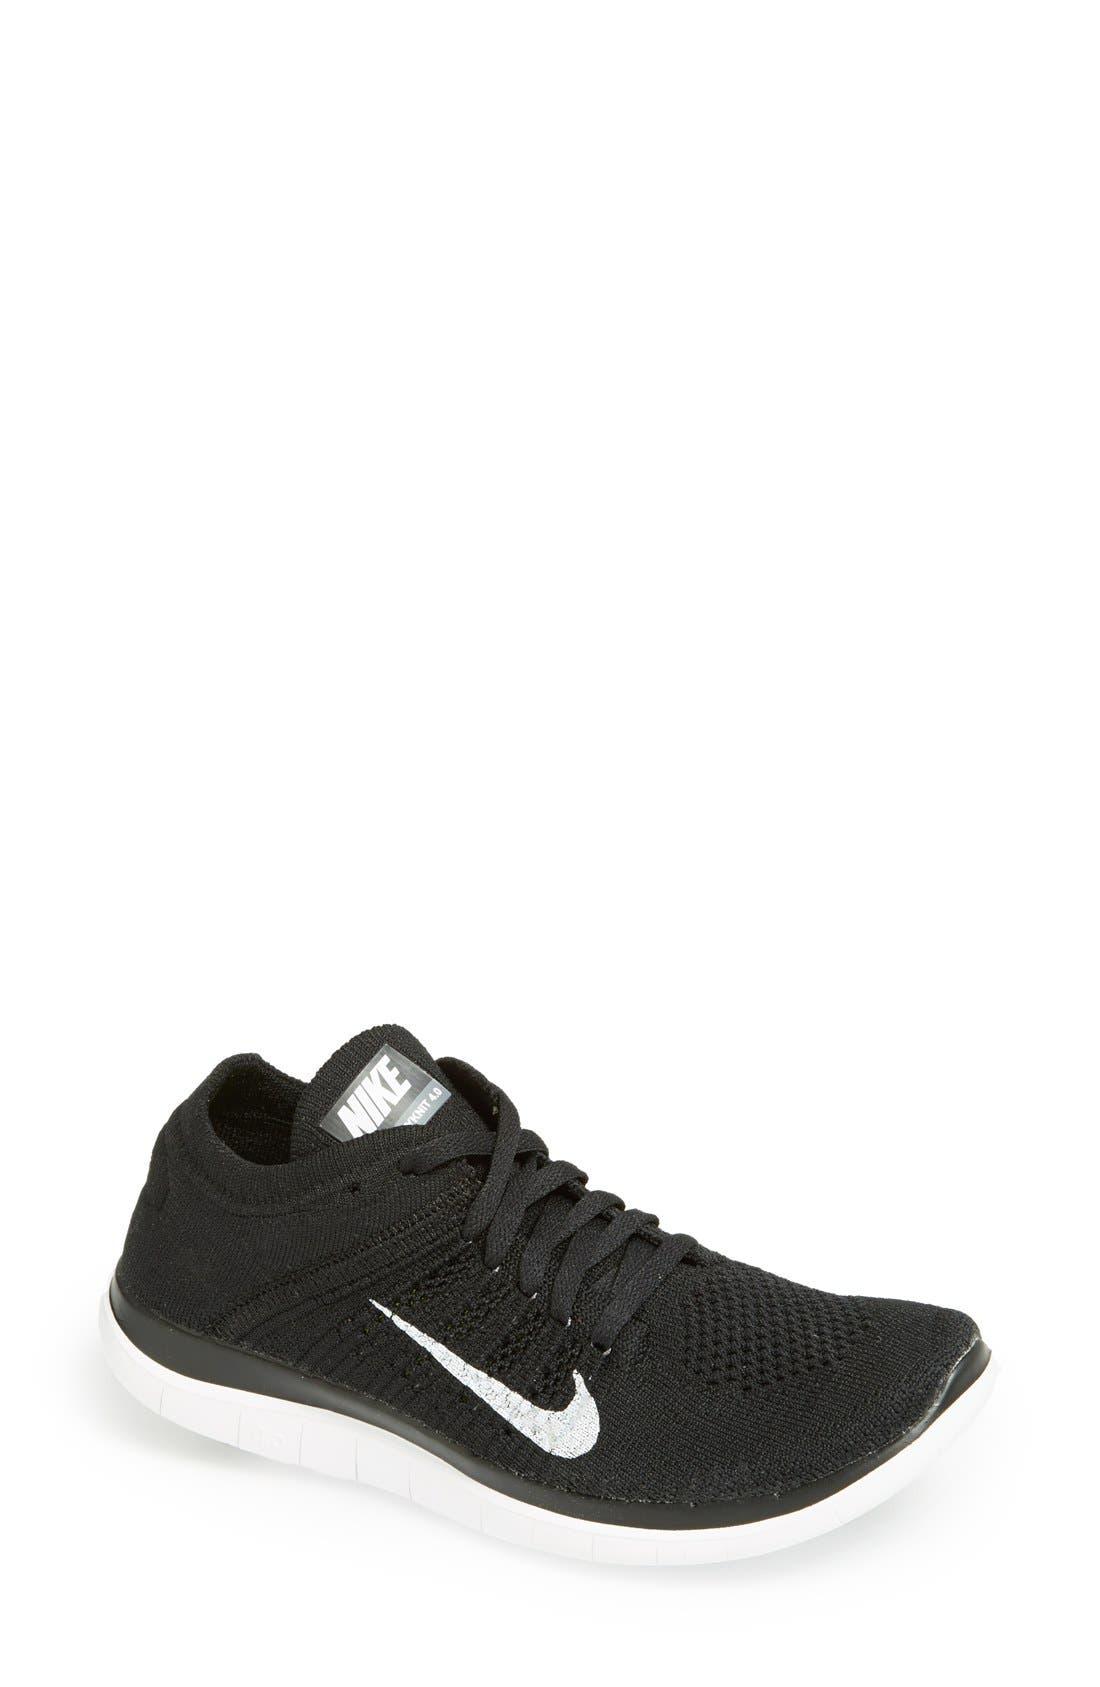 NIKE 'Free 4.0 Flyknit' Running Shoe, Main, color, 001